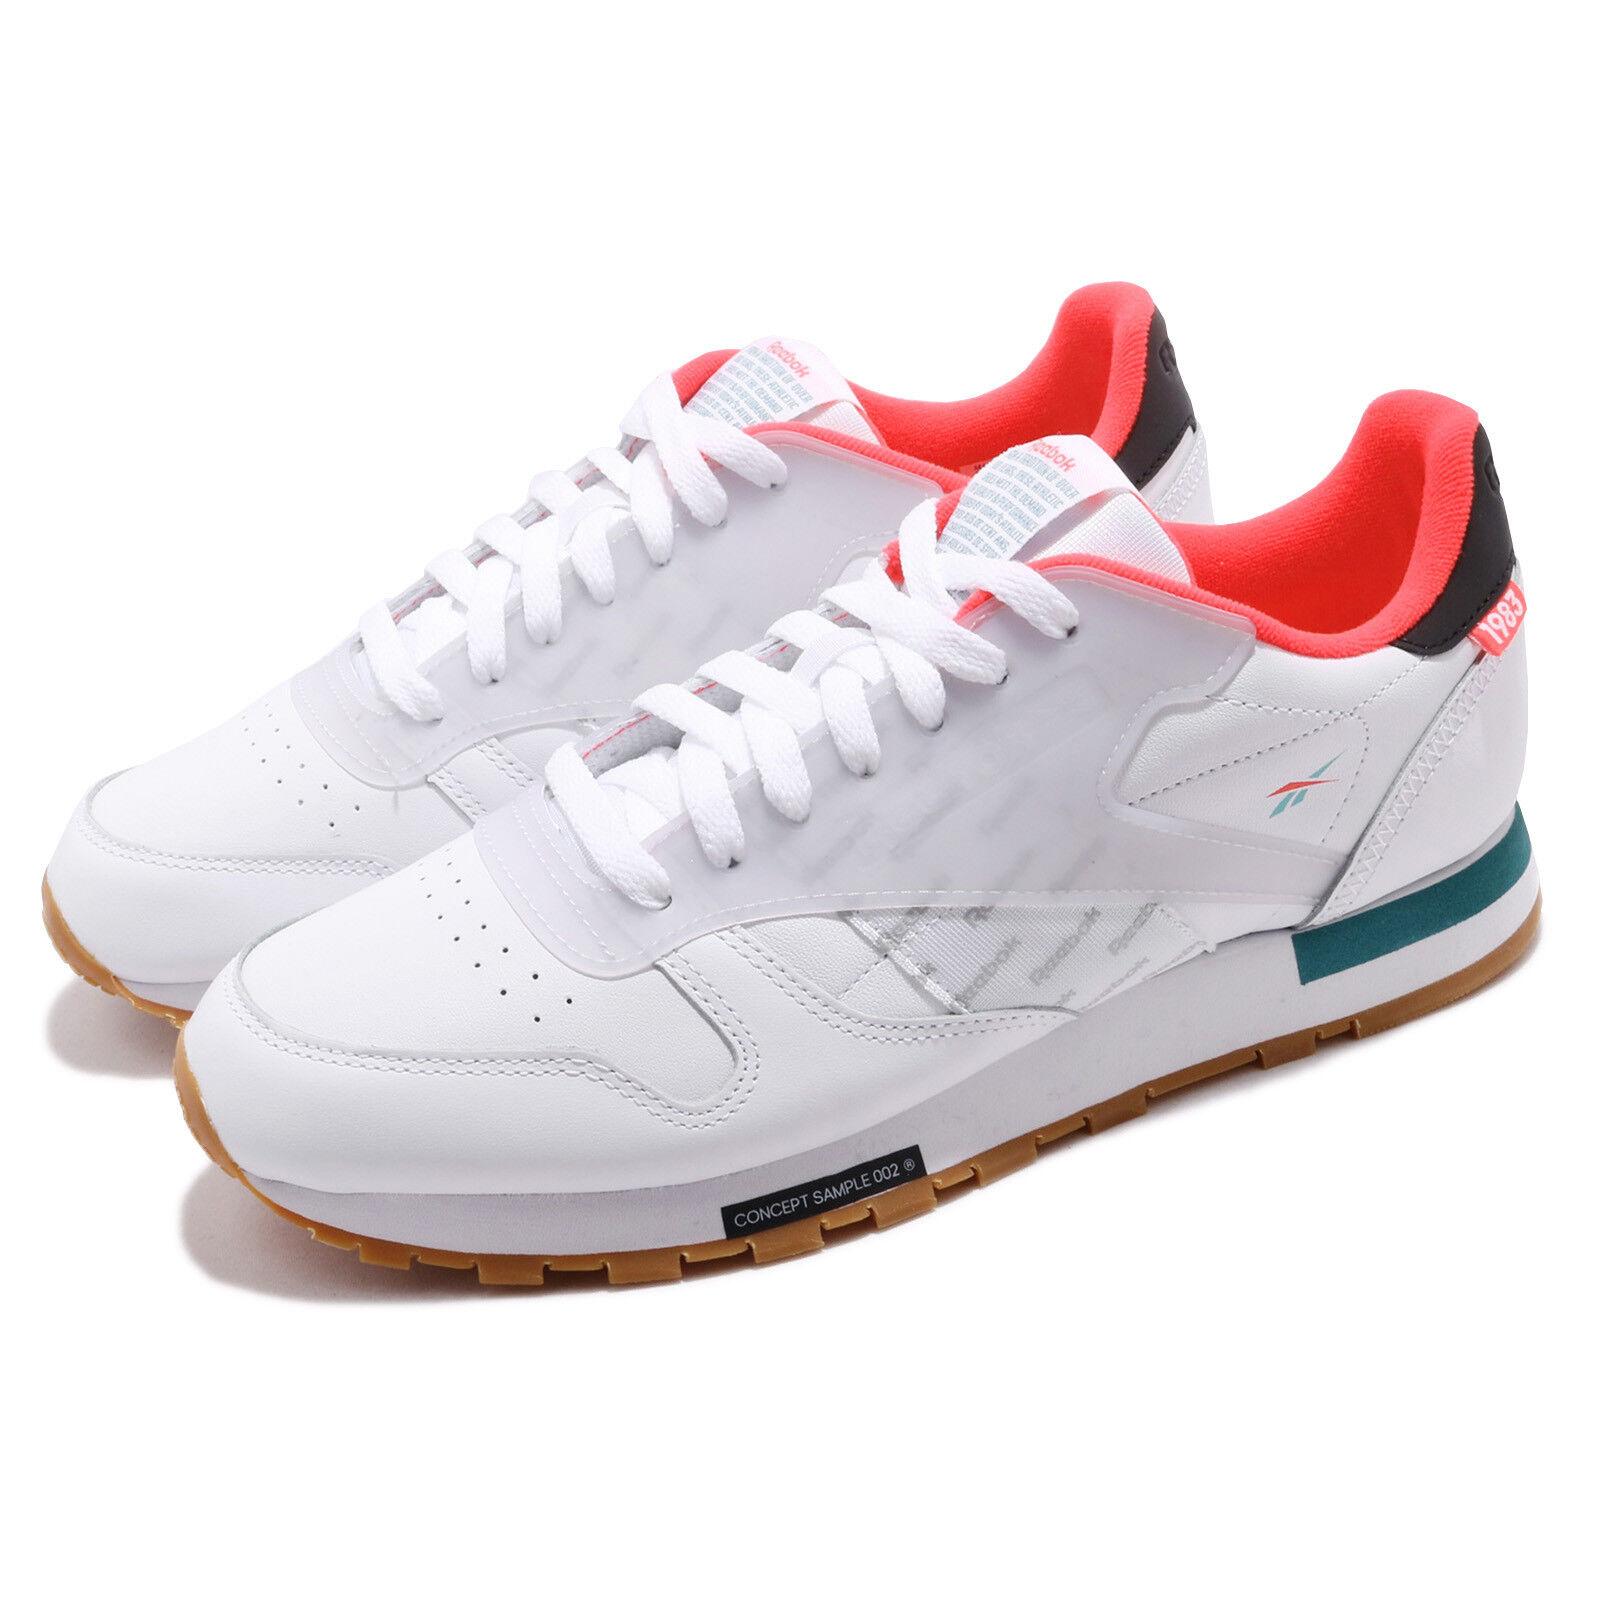 Reebok Classic cuir Alterouge ATI blanc rouge Mist Gum Hommes chaussures paniers DV5239